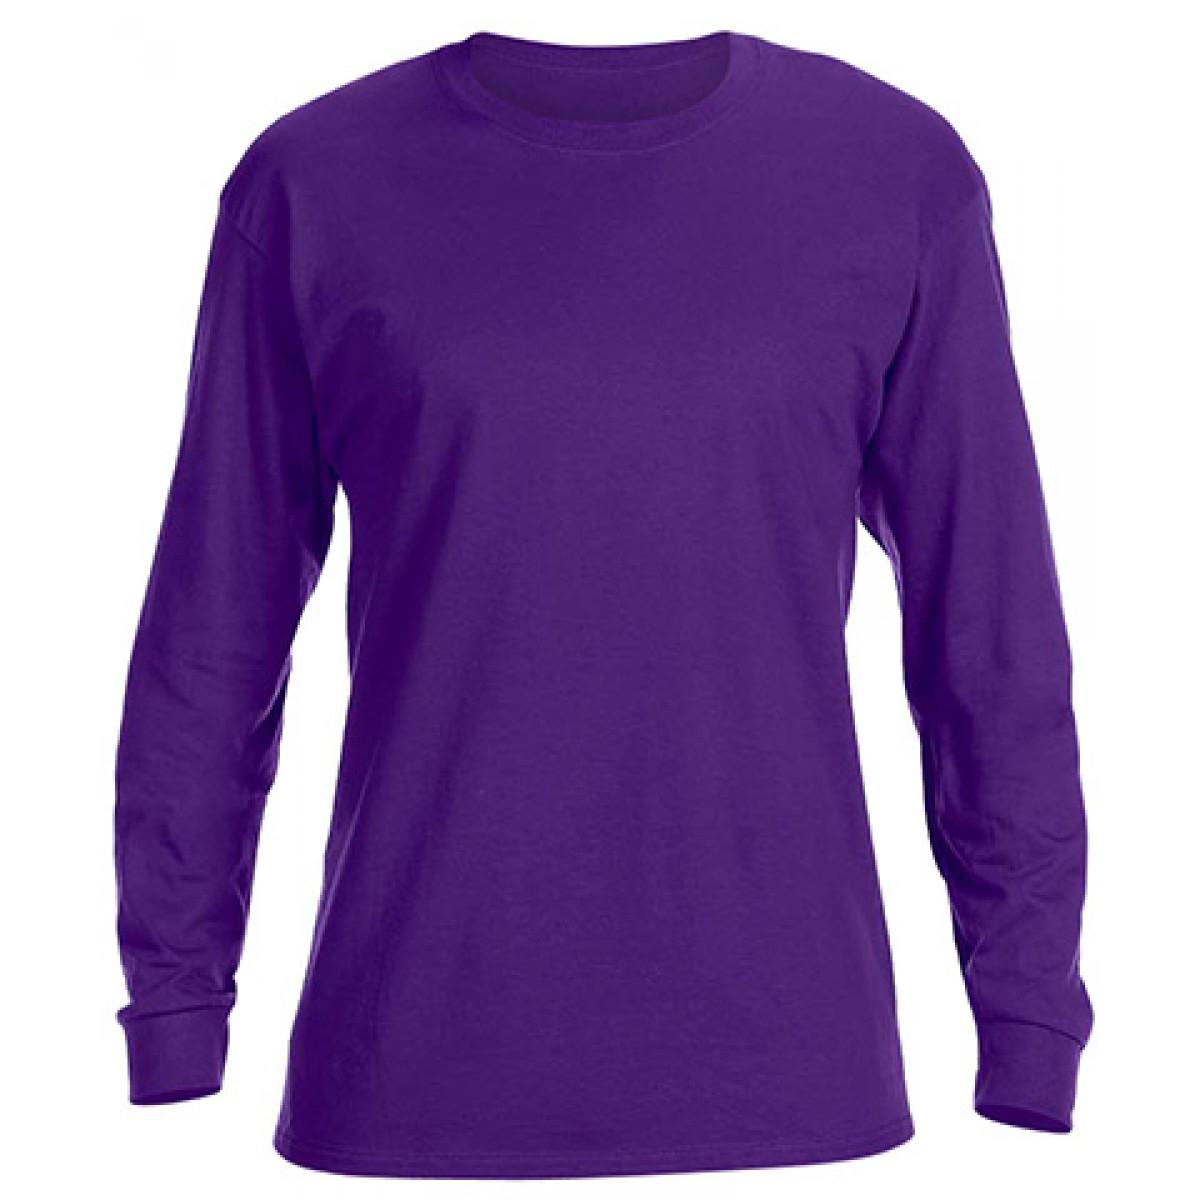 Basic Long Sleeve Crew Neck -Purple-S